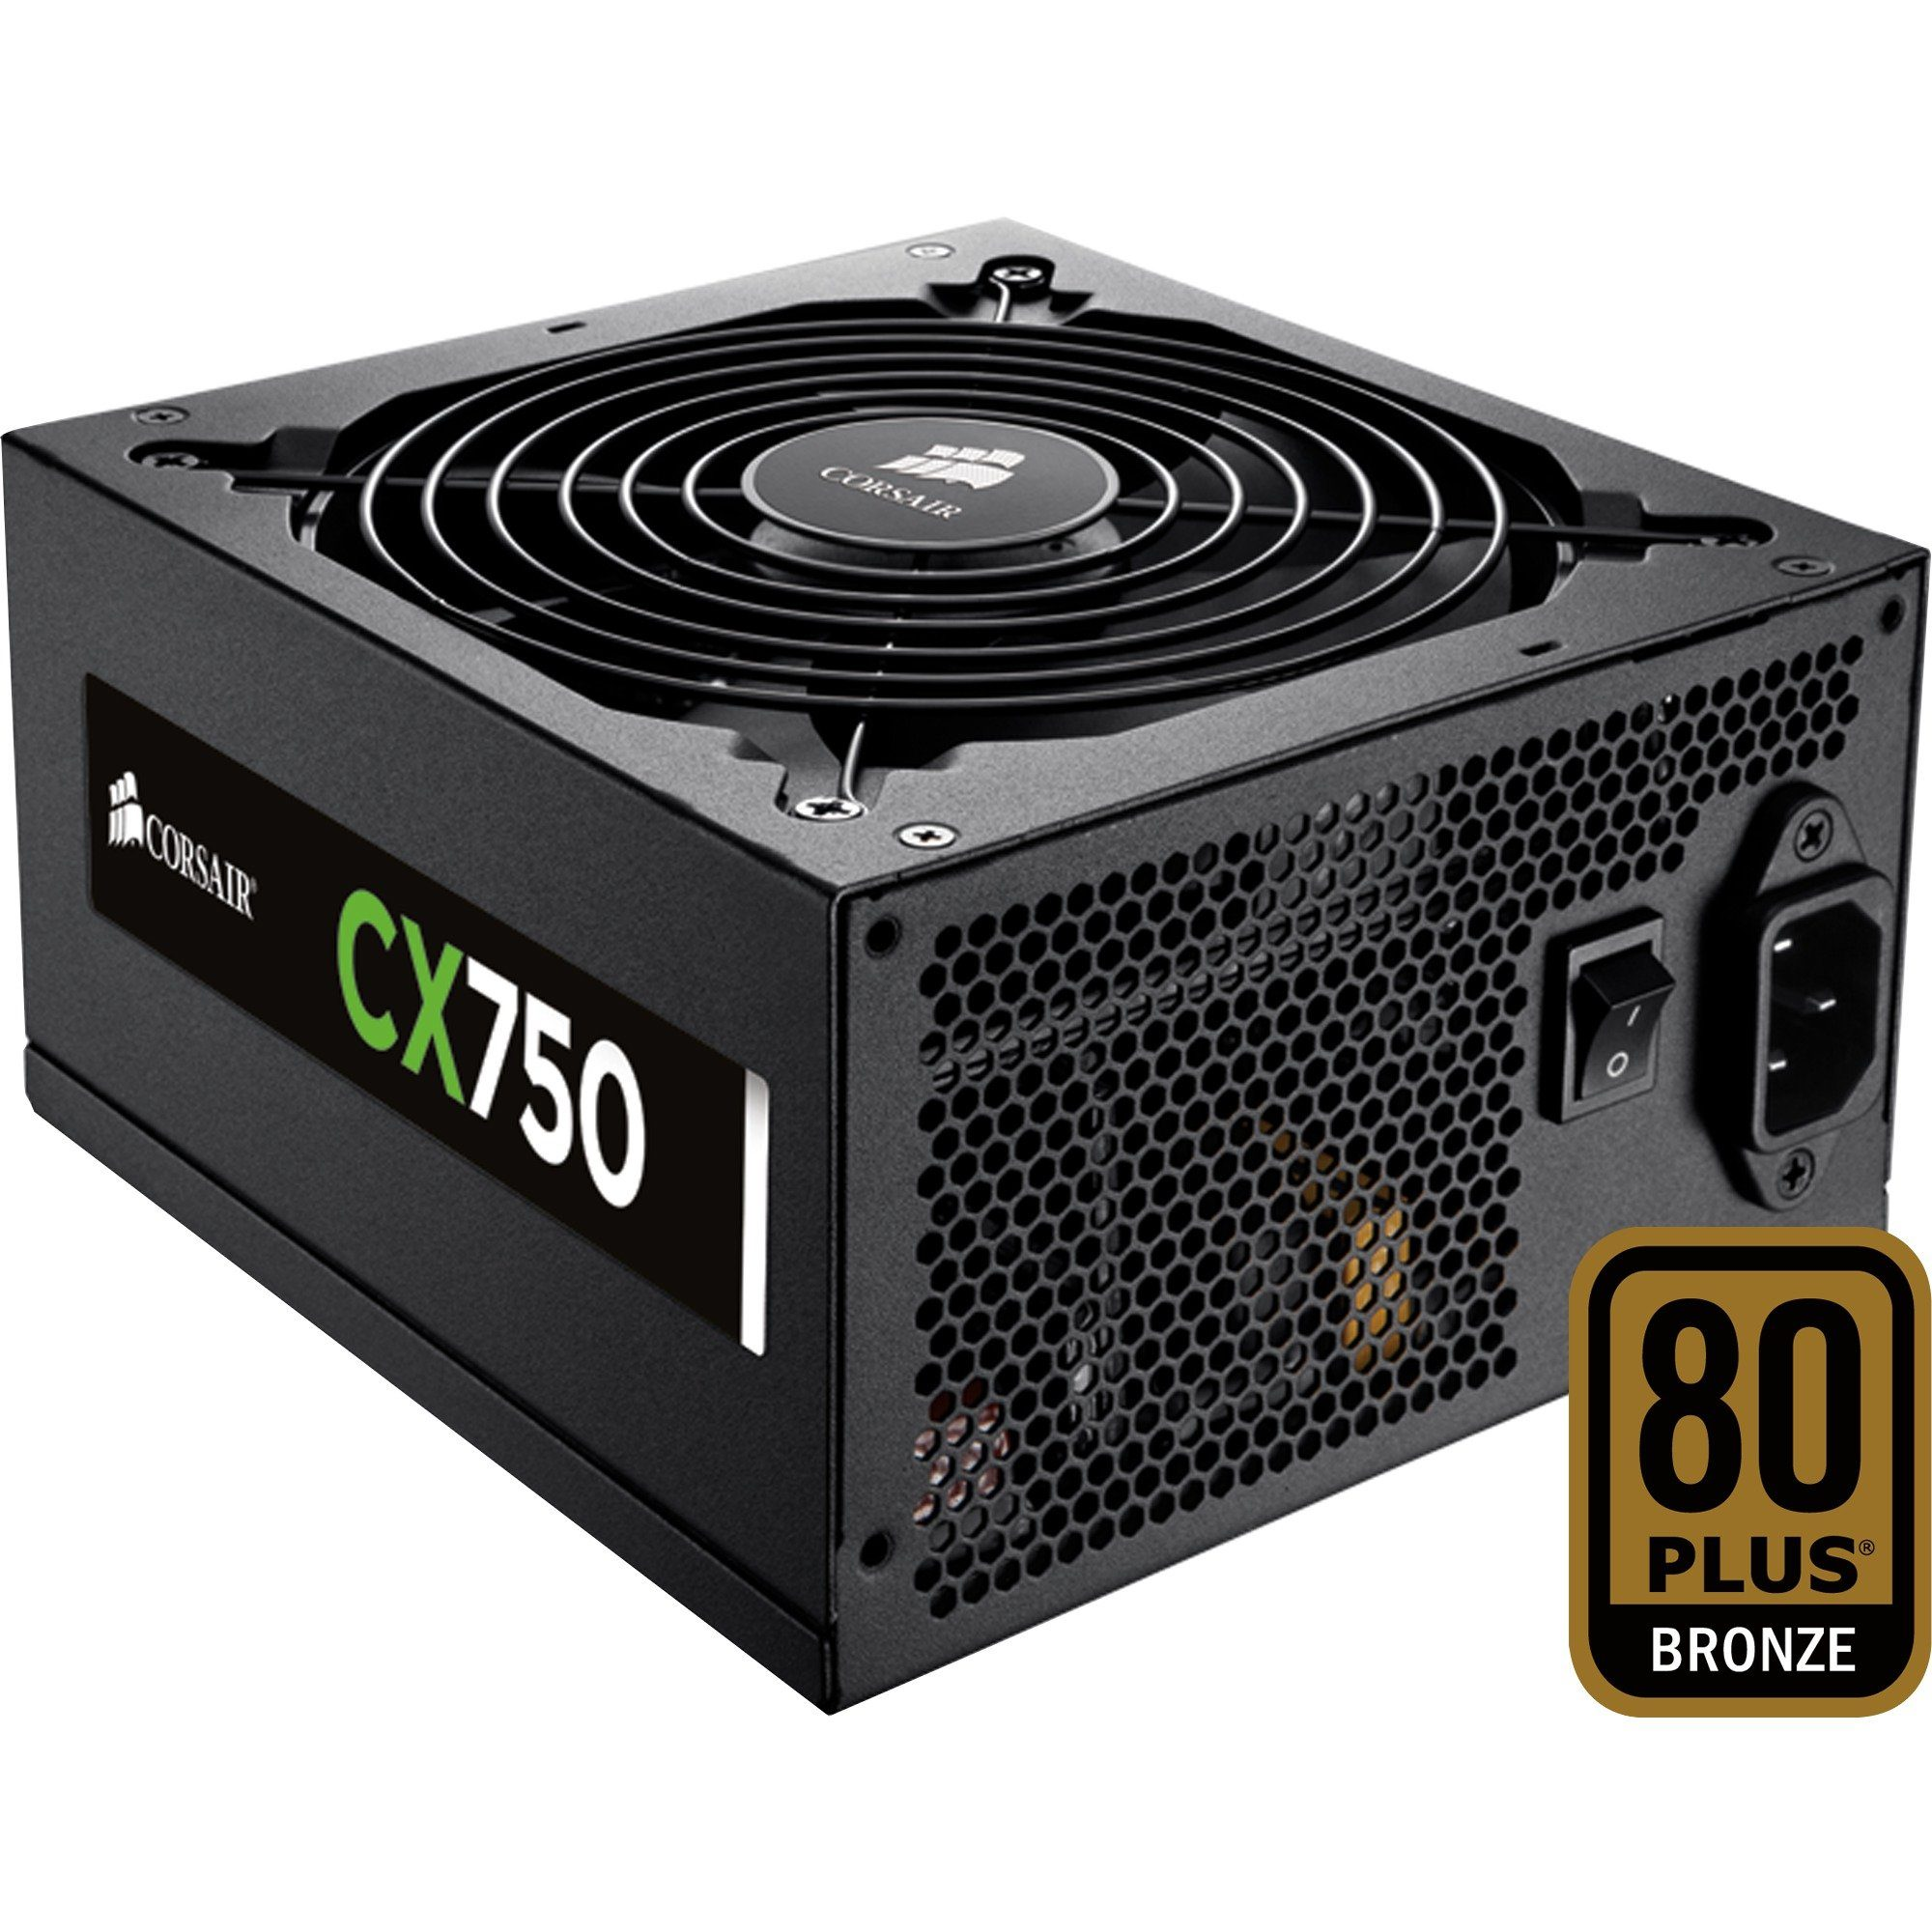 Corsair PC-Netzteil »CX750«